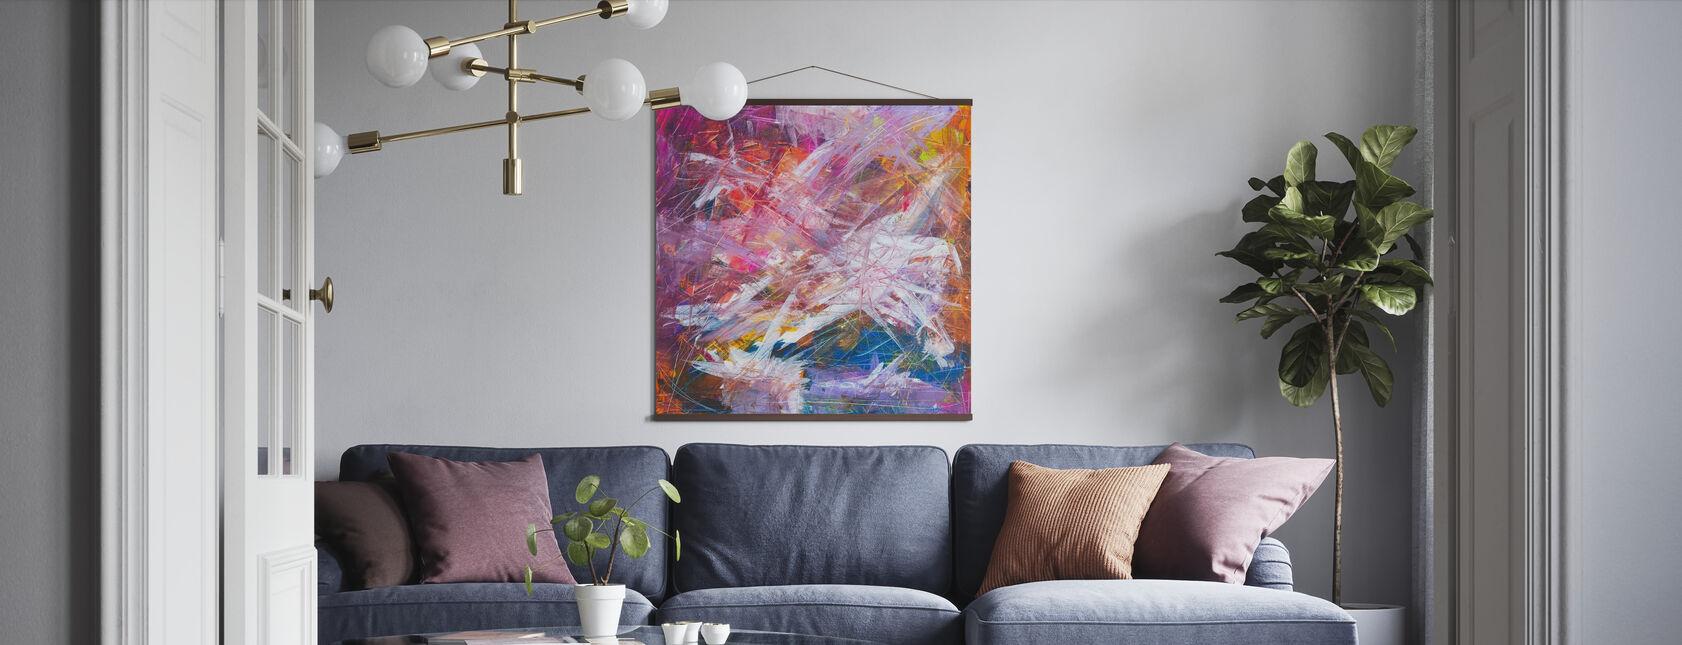 Abstrakt maleri - Plakat - Stue